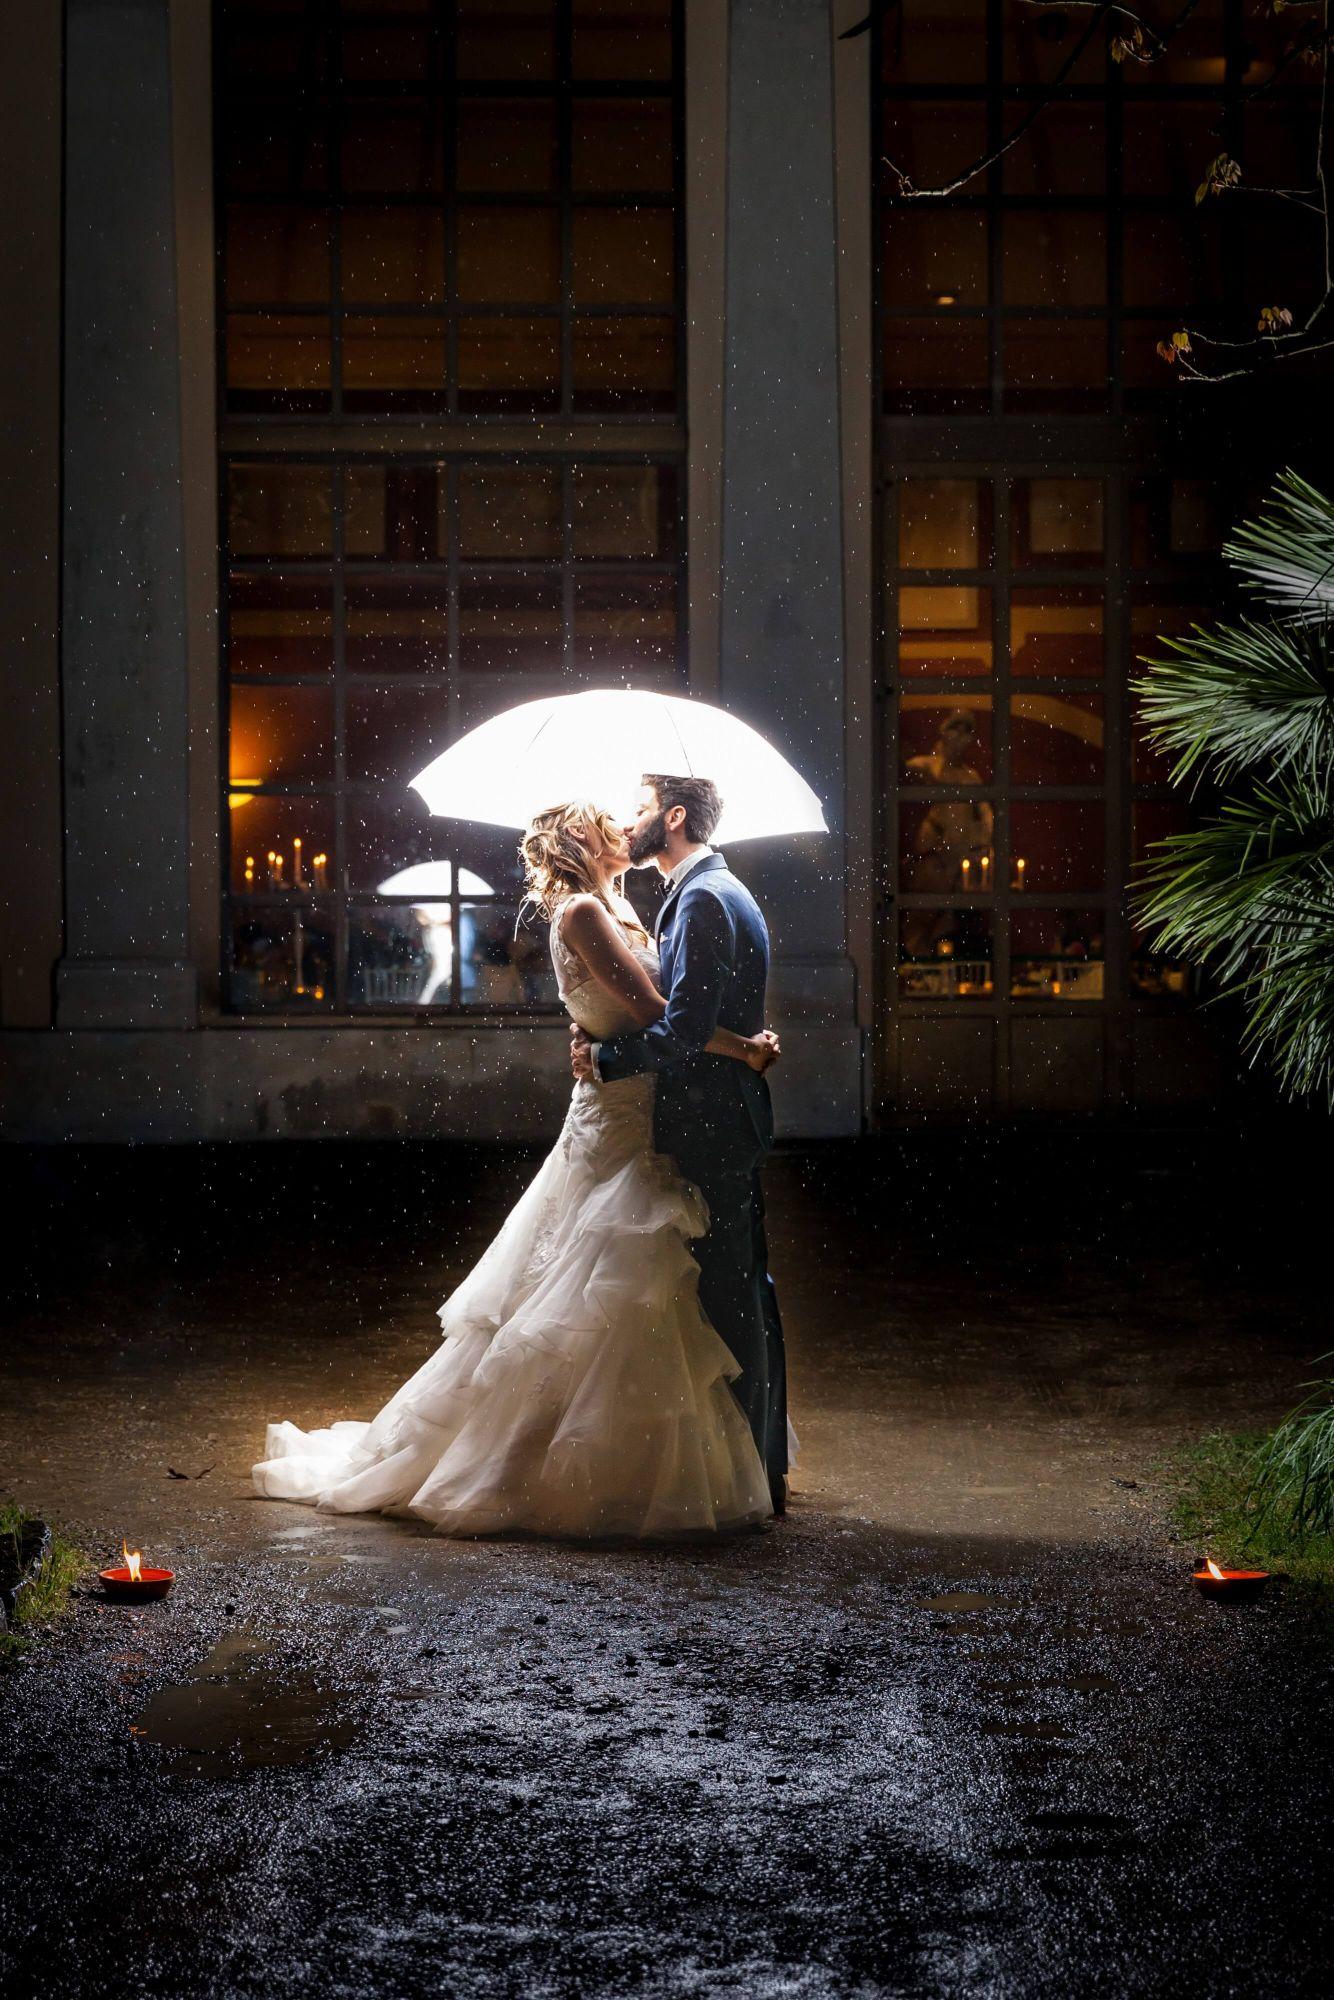 matrimonio G&S - villa Stibbert - Firenze